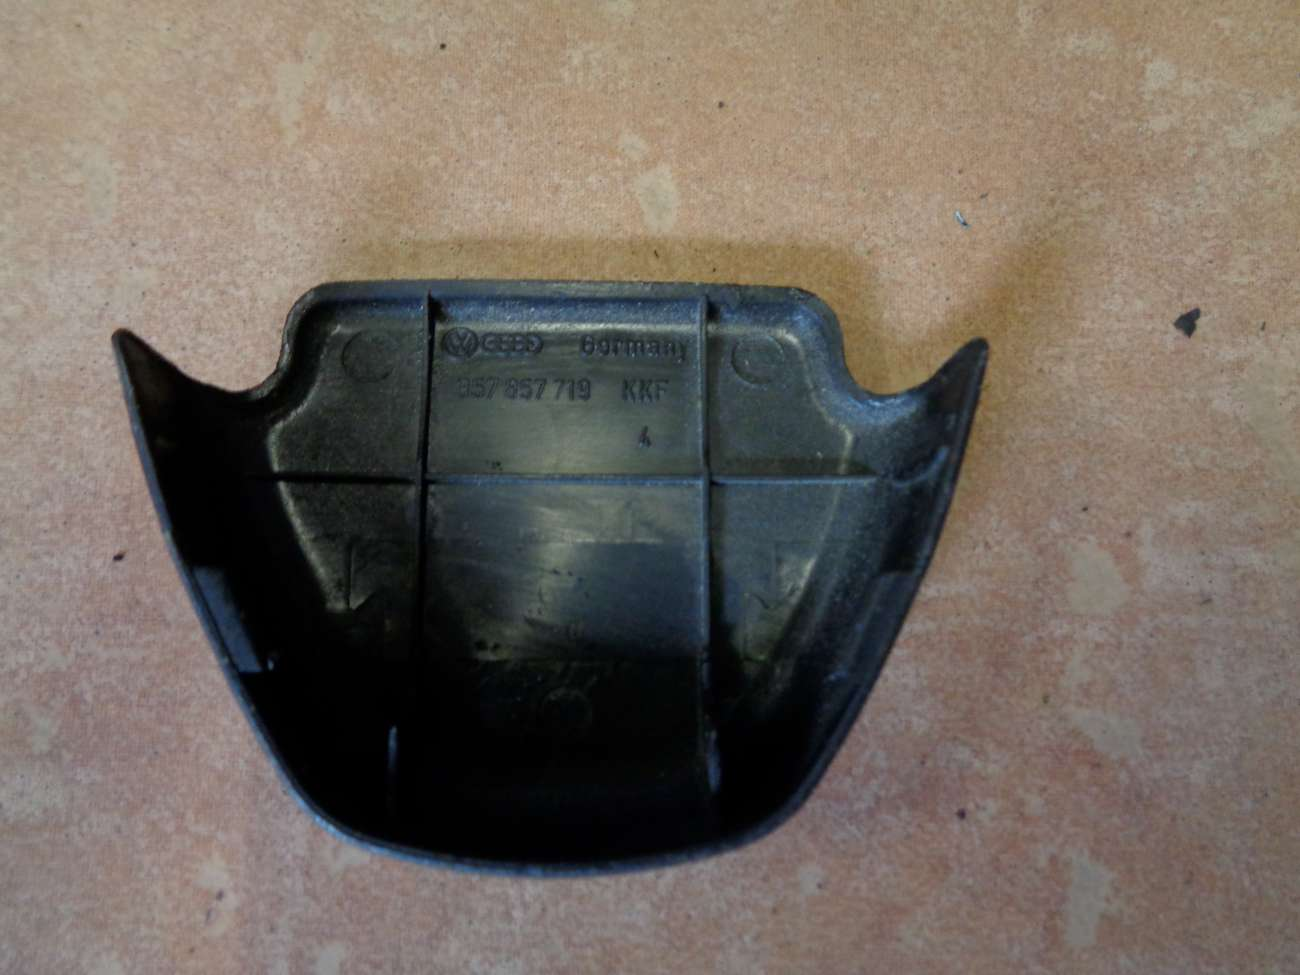 VW Passat 35i Abdeckung Kappe B Säule Gurt Befestigung 357857719 4601C75